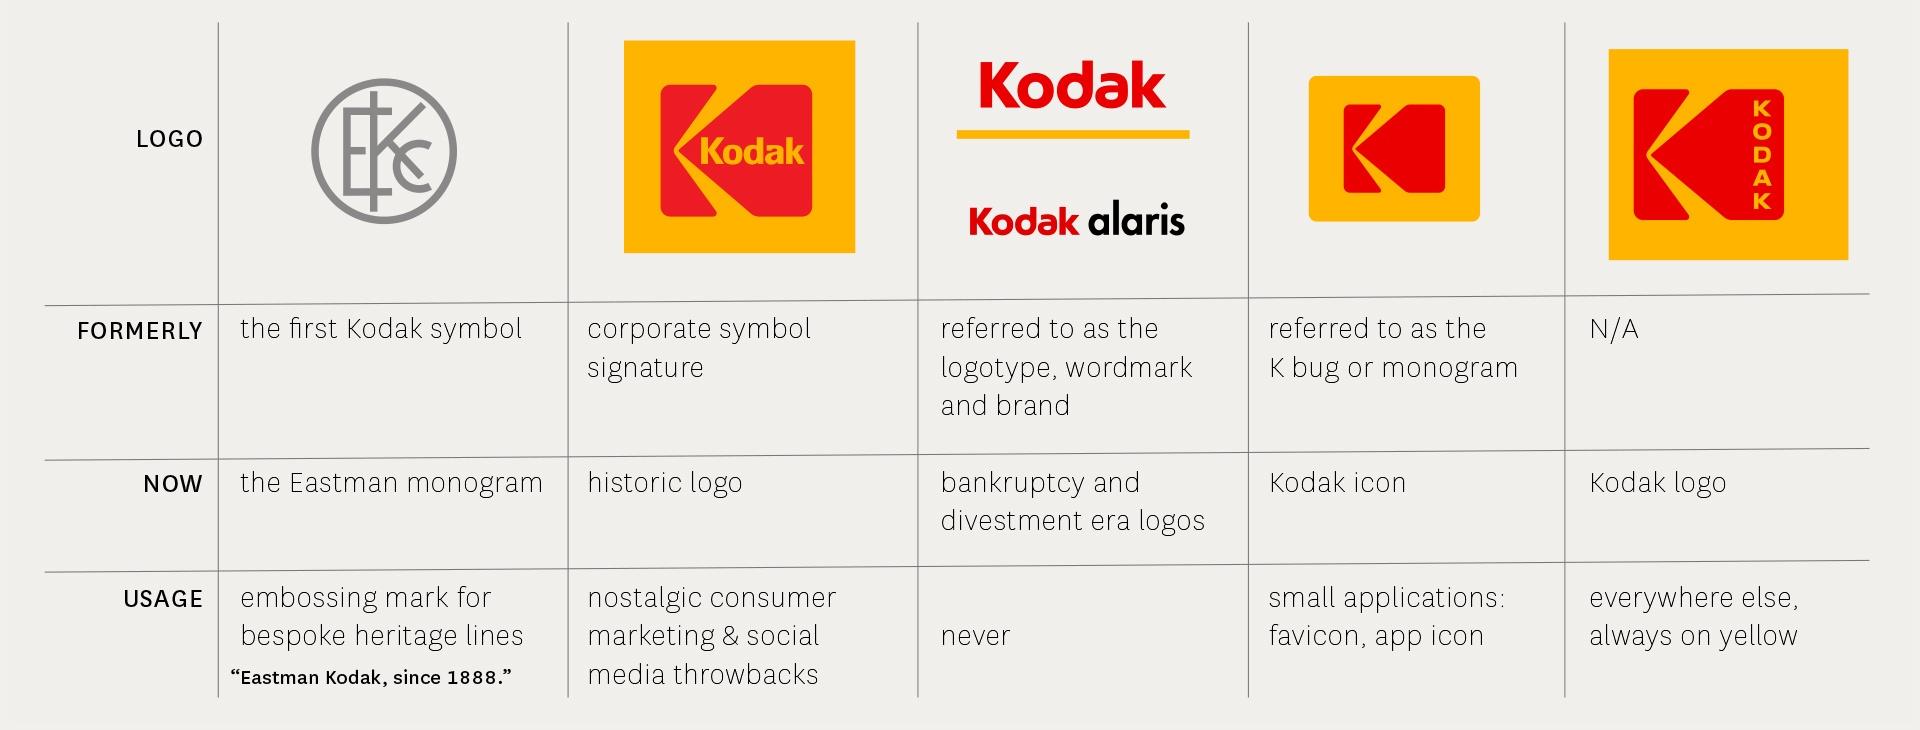 Kodak brand architecture